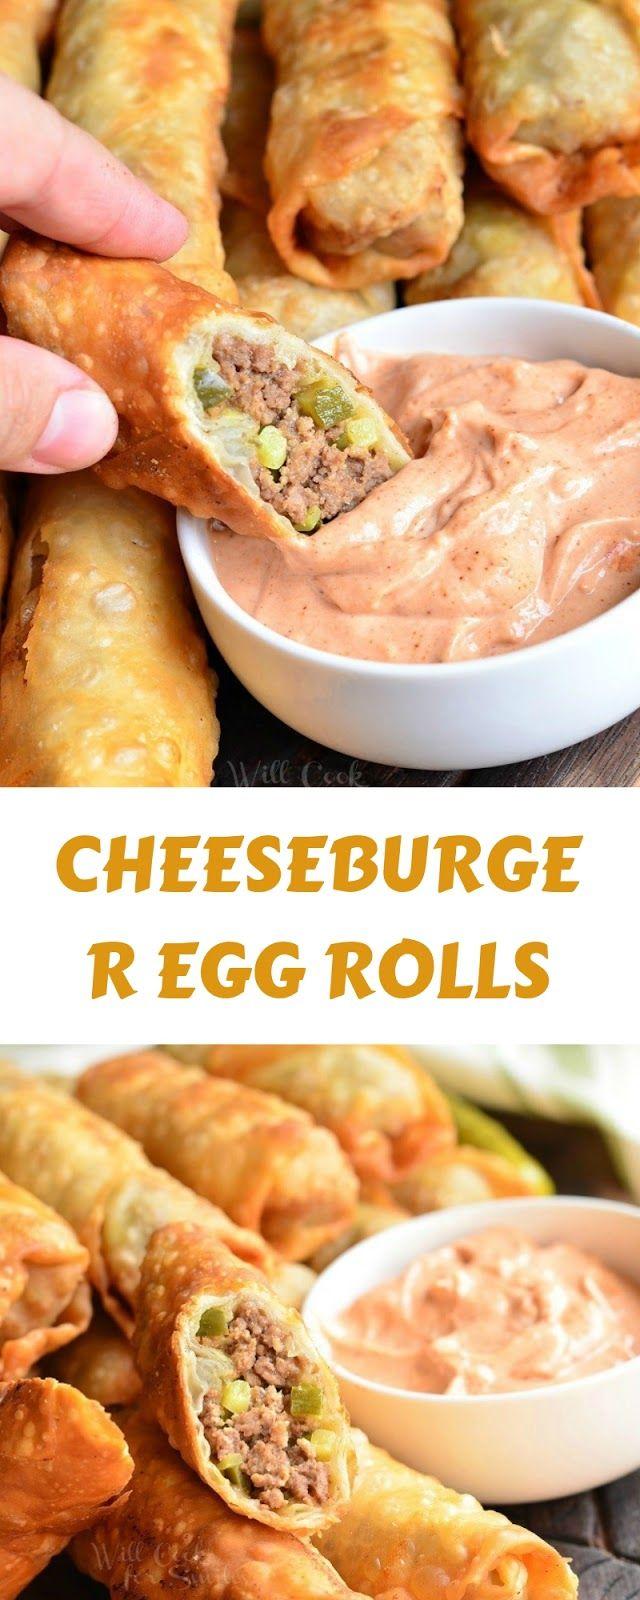 Cheeseburger Egg Rolls #eggrolls